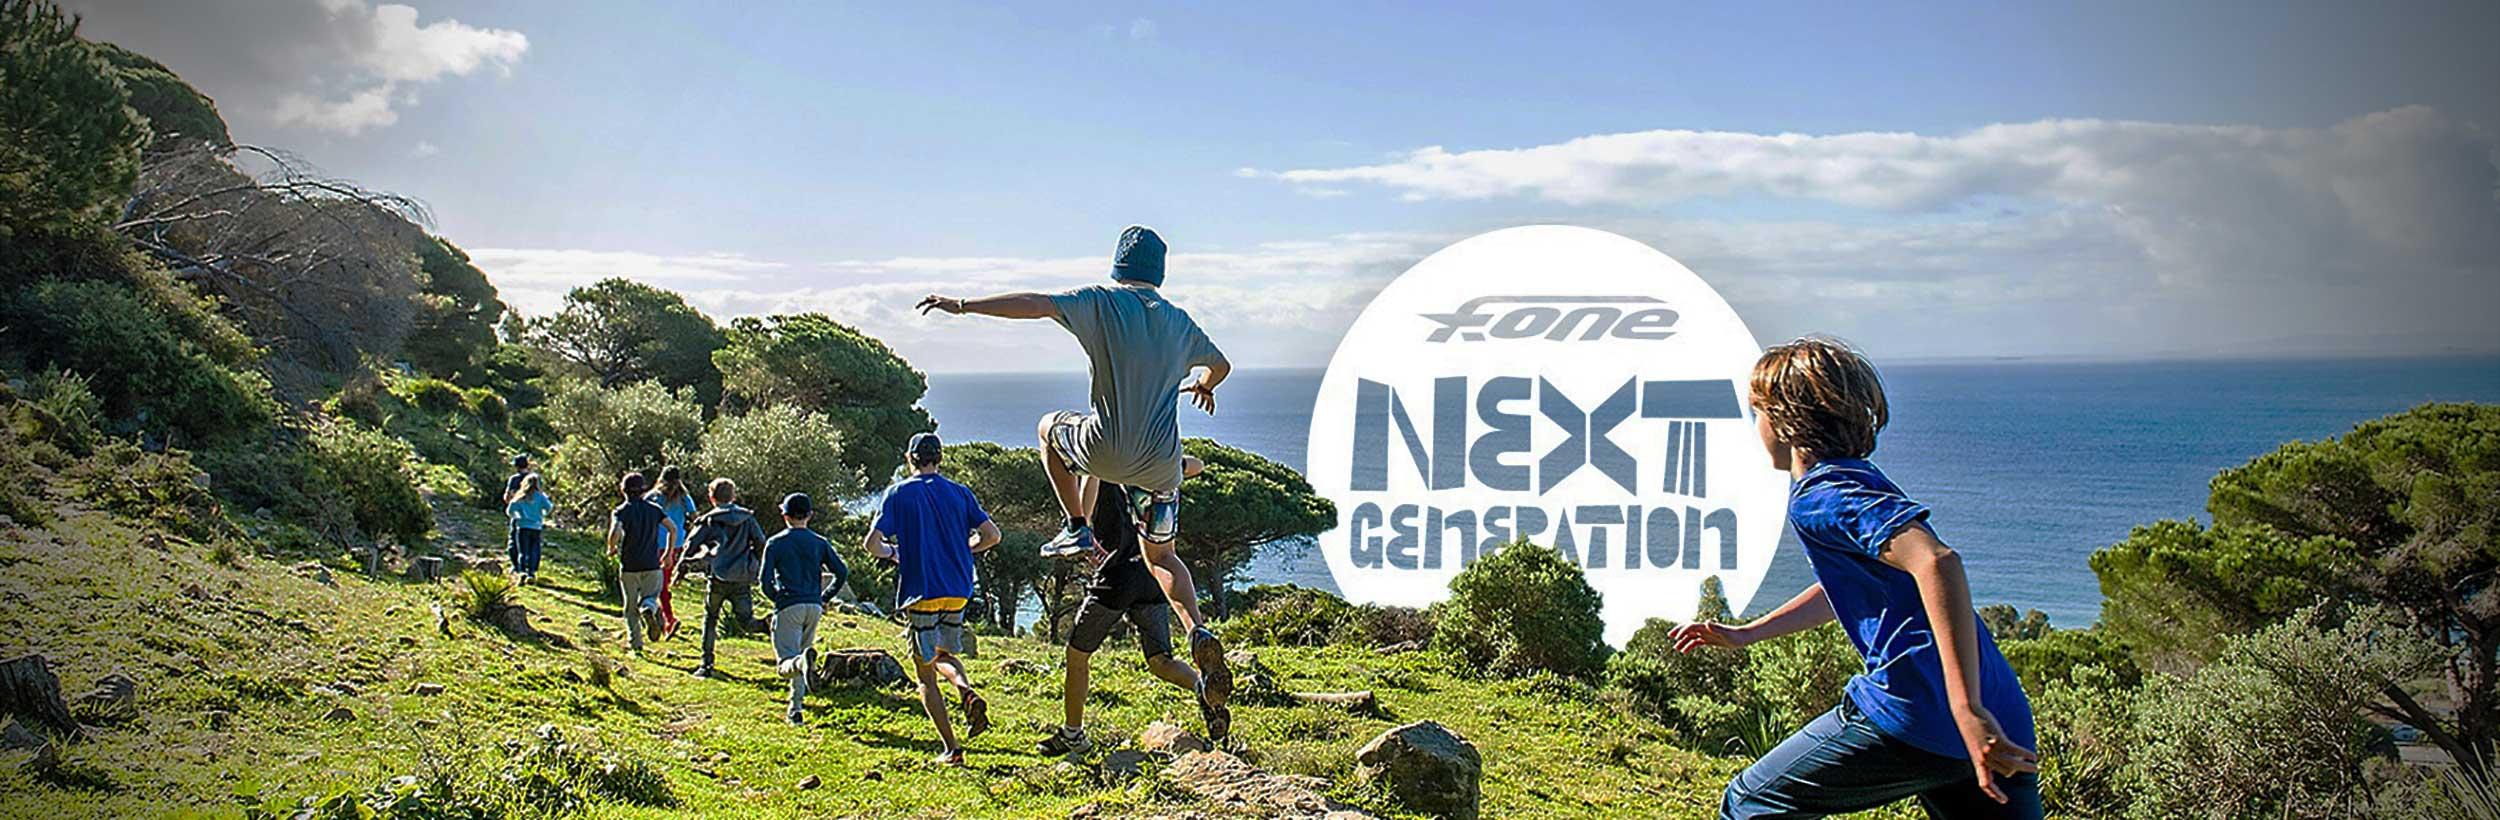 F-One kites next generation movie 2016 Kiteworld Magazine